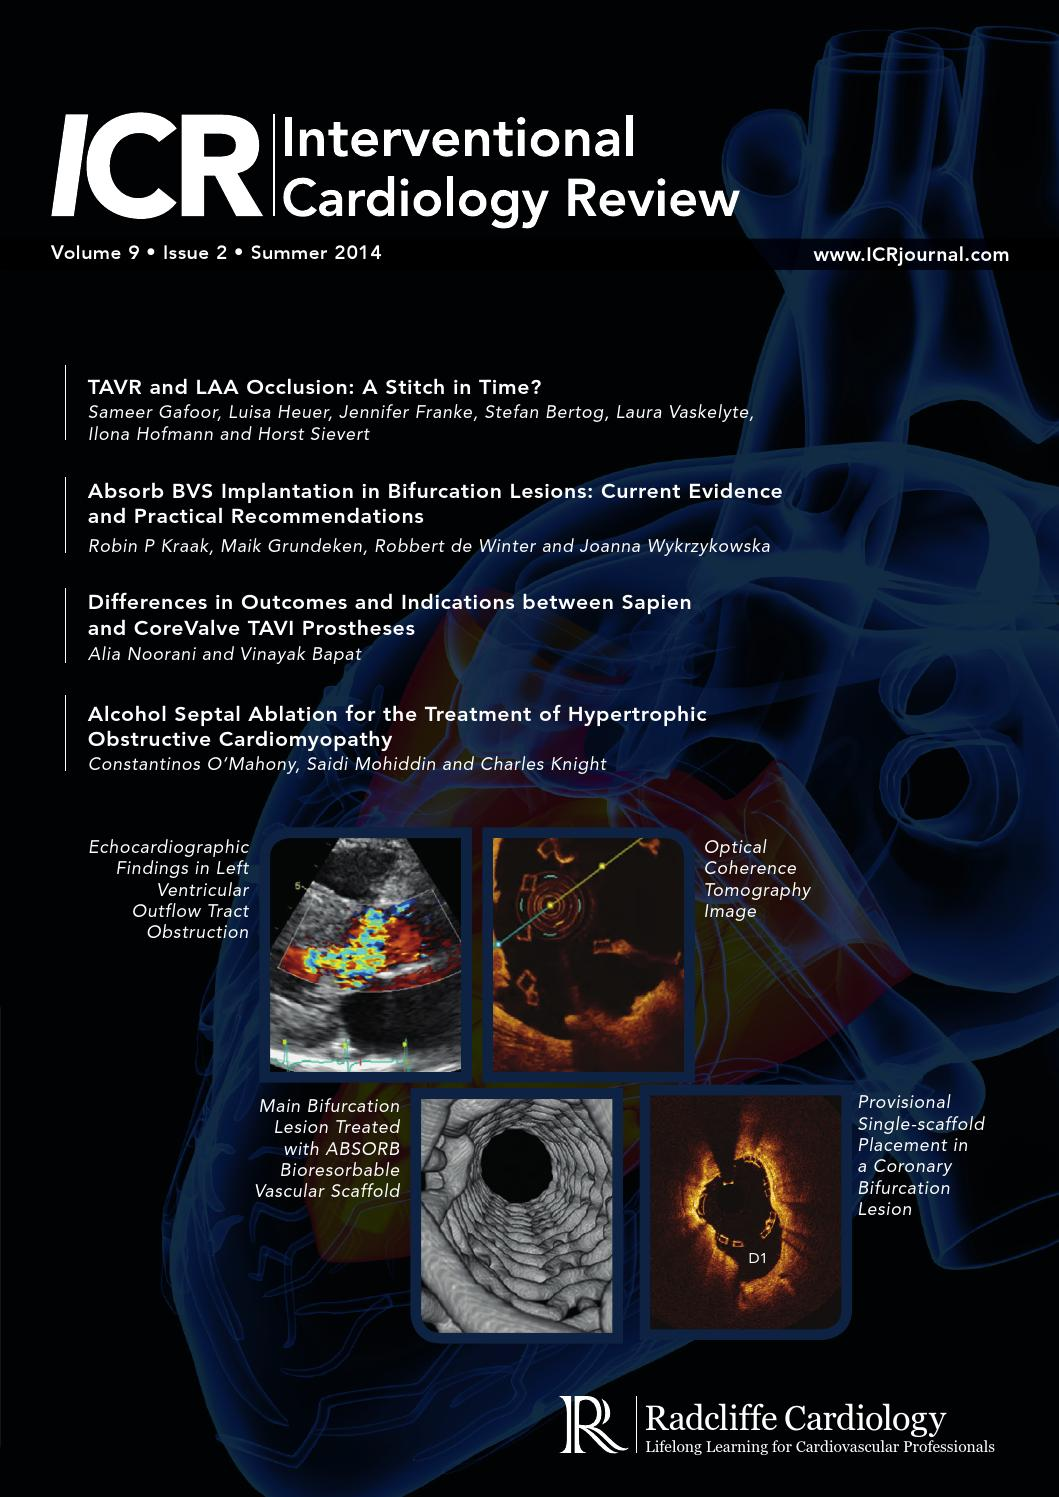 ICR 9.2 by Radcliffe Cardiology - issuu